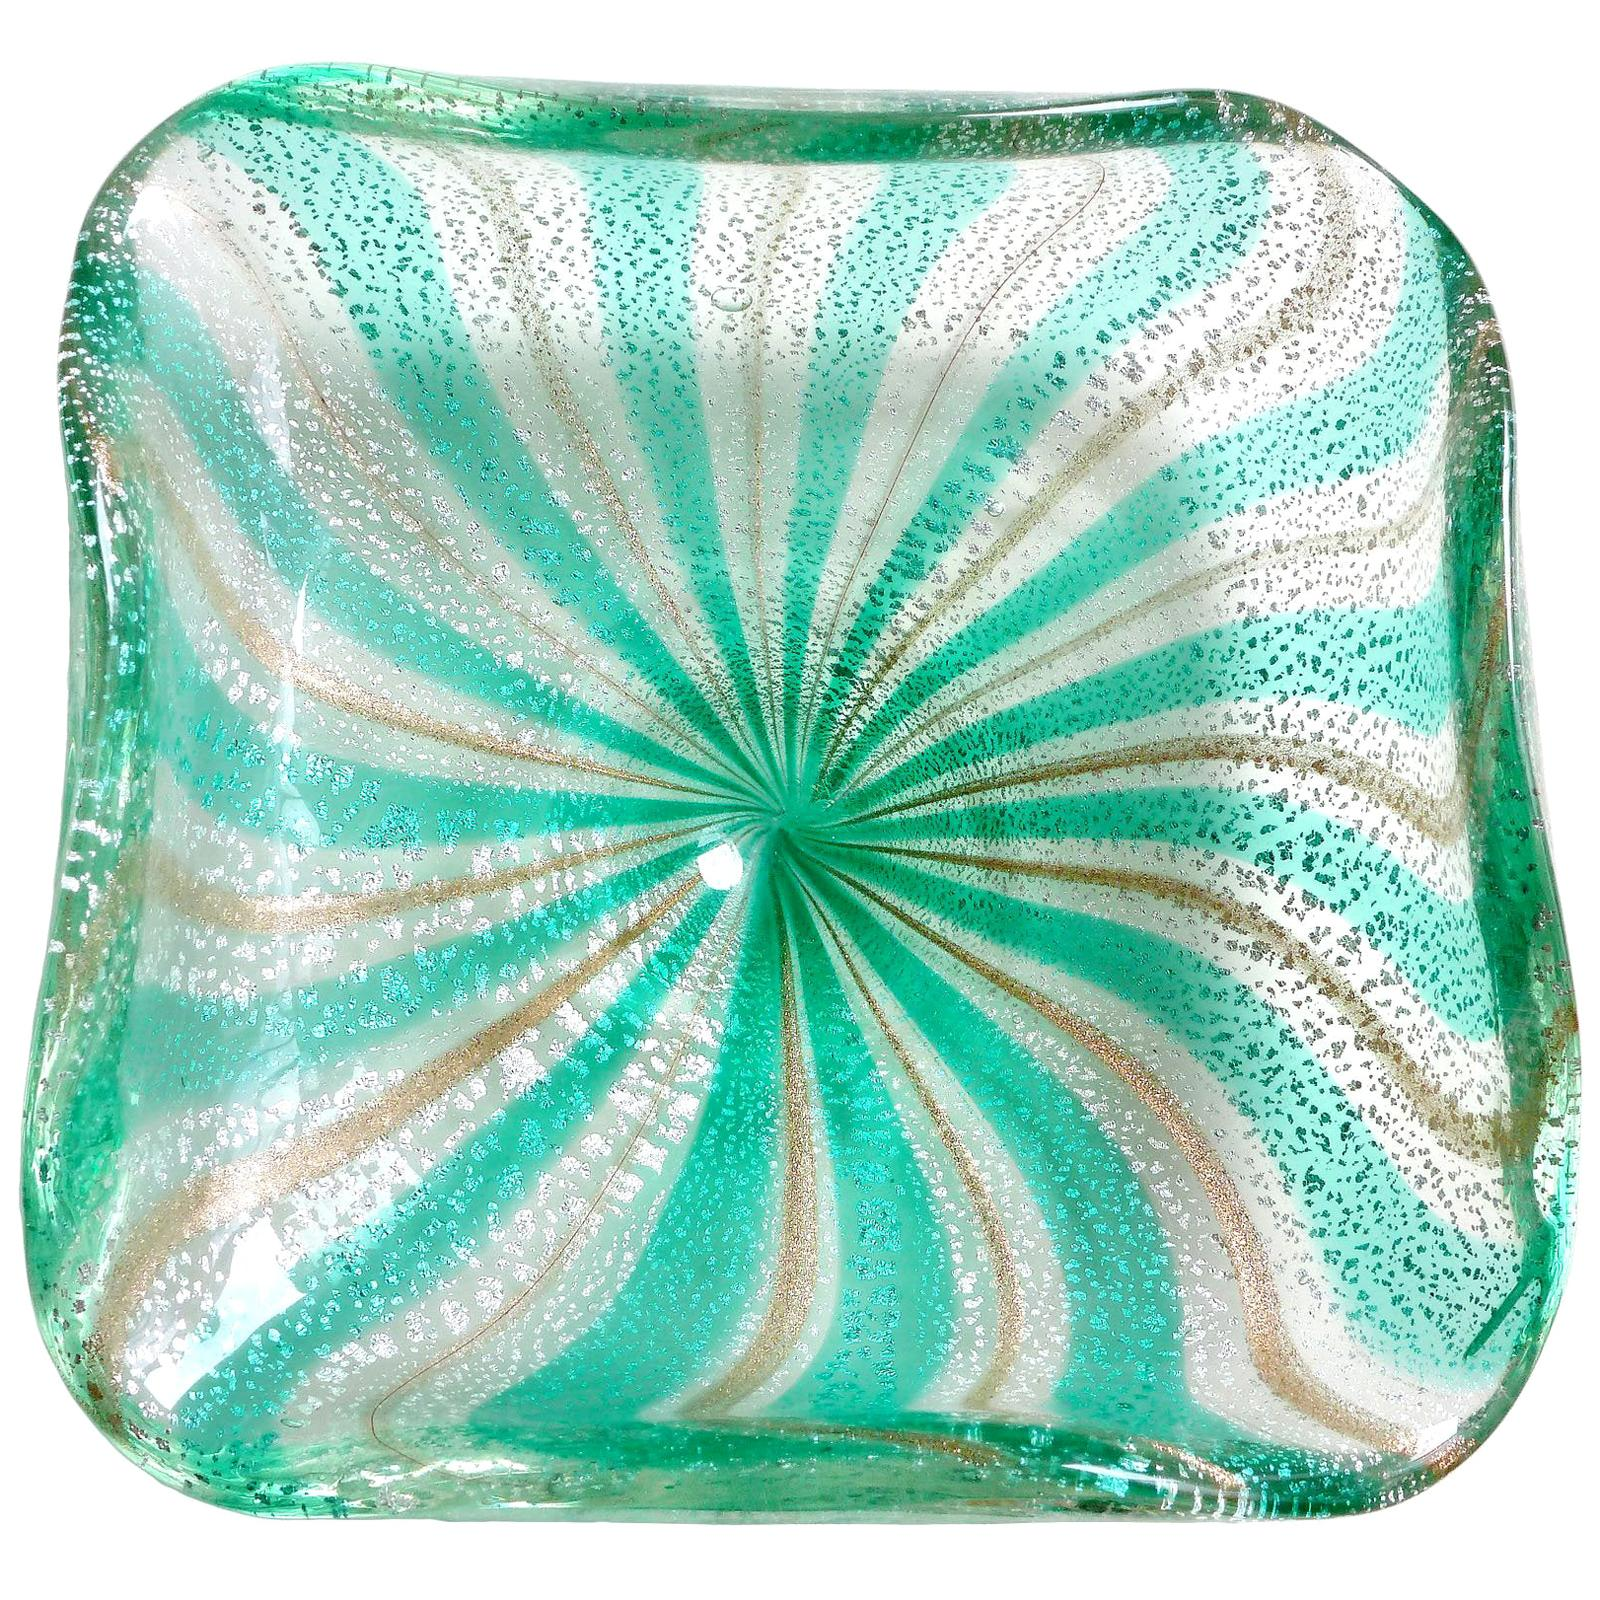 A.Ve.M. Murano Green Silver Aventurine Flecks Italian Glass Striped Bowl